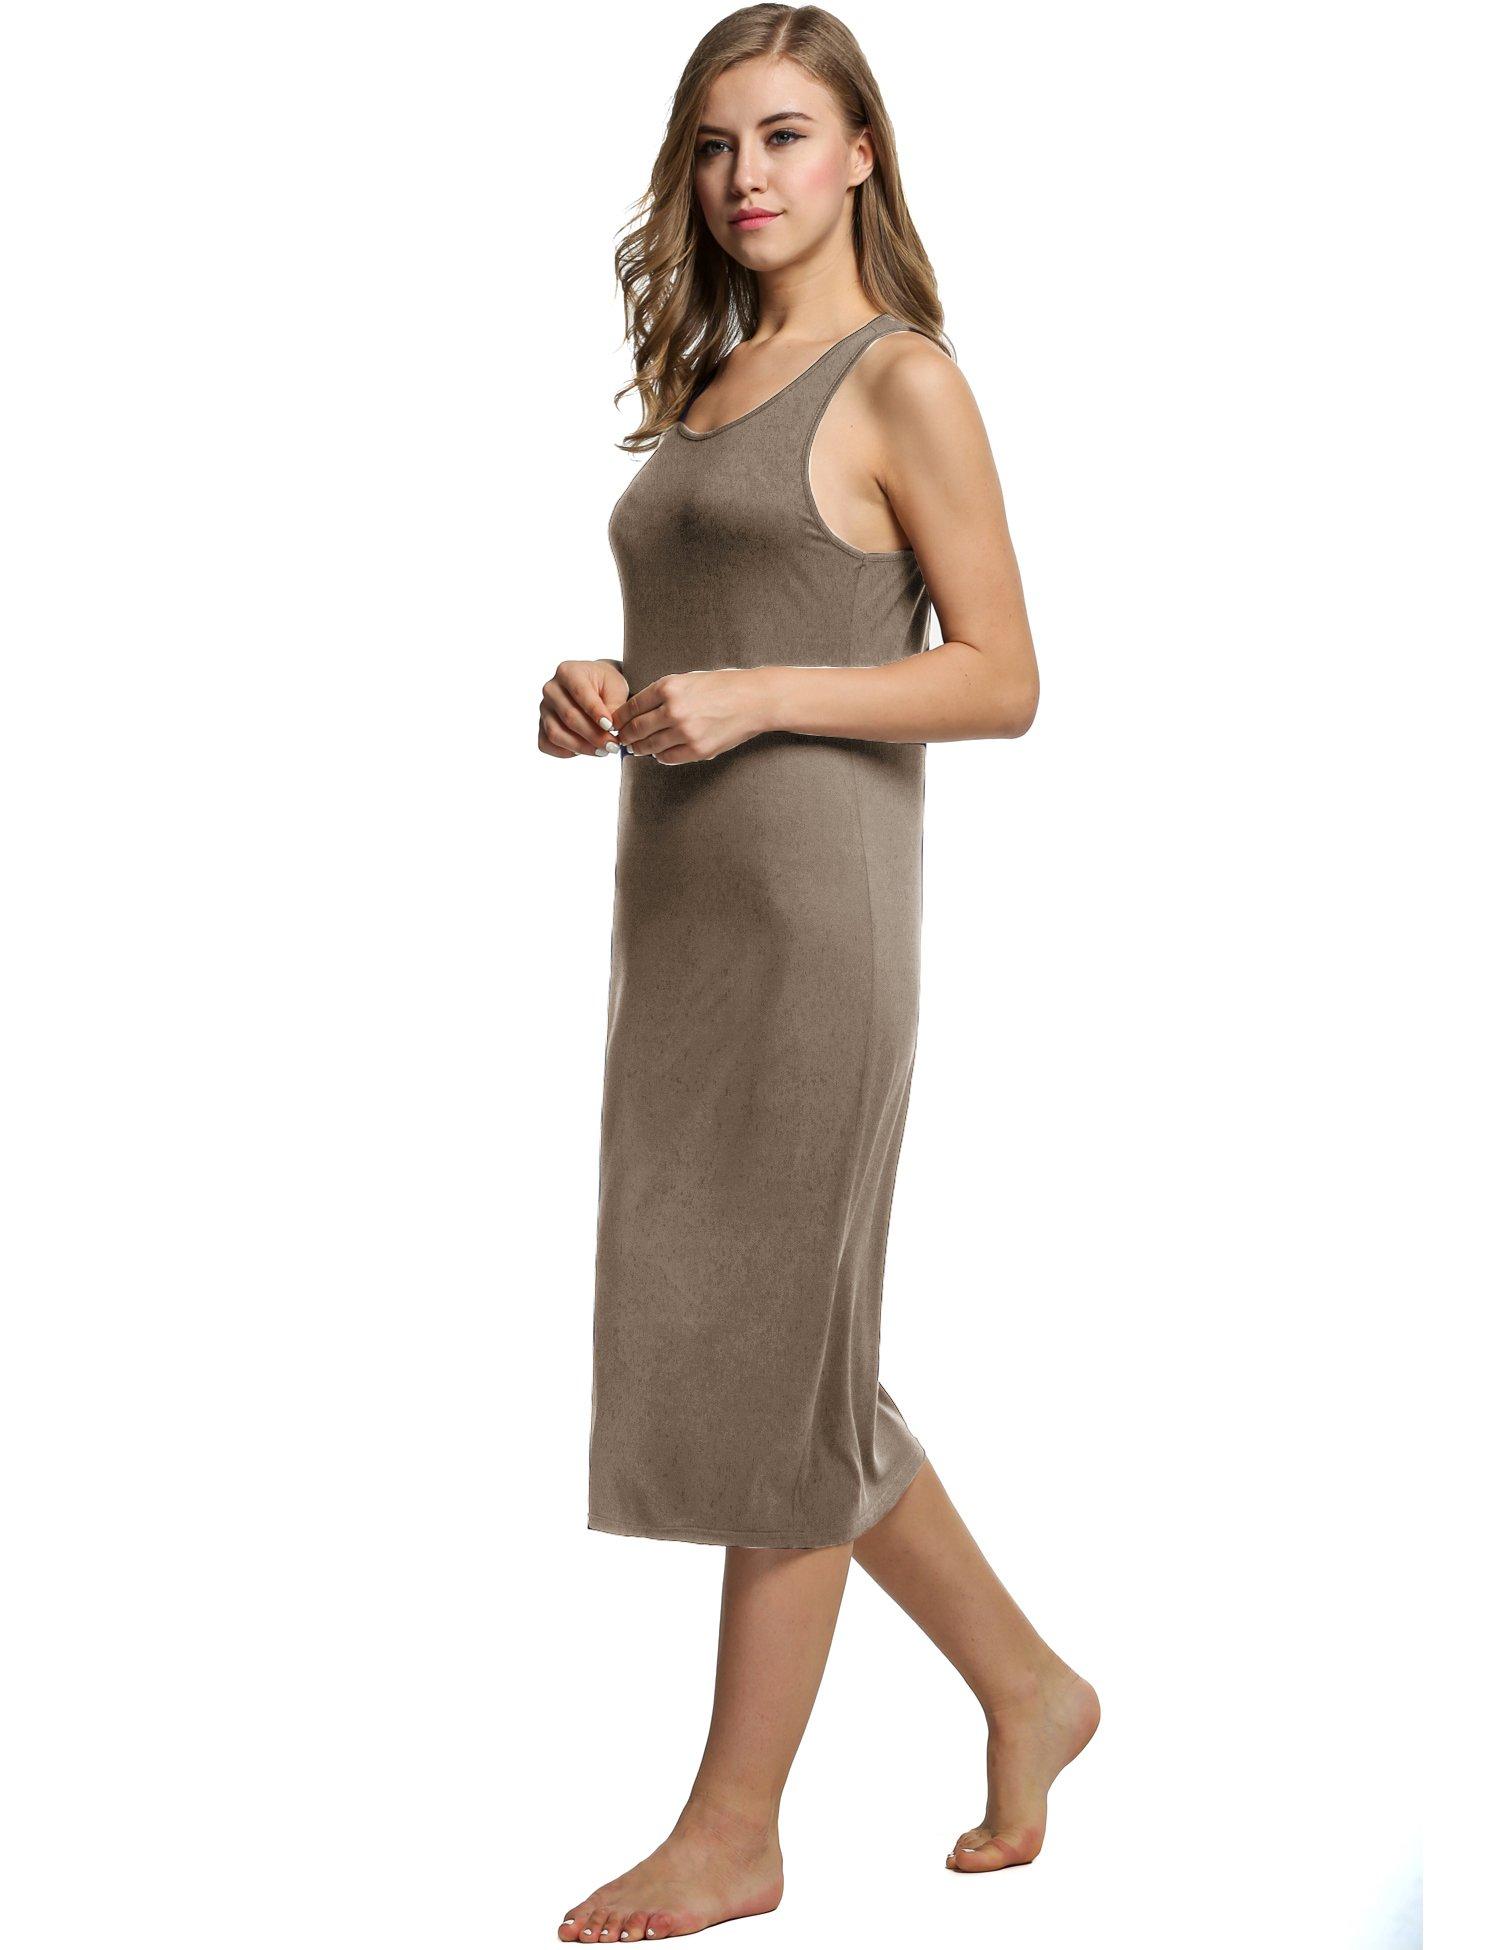 Avidlove Womens Cotton Gown Sleeveless Nightshirt Sleepwear Racerback Bodycon Dress,Camel,Small